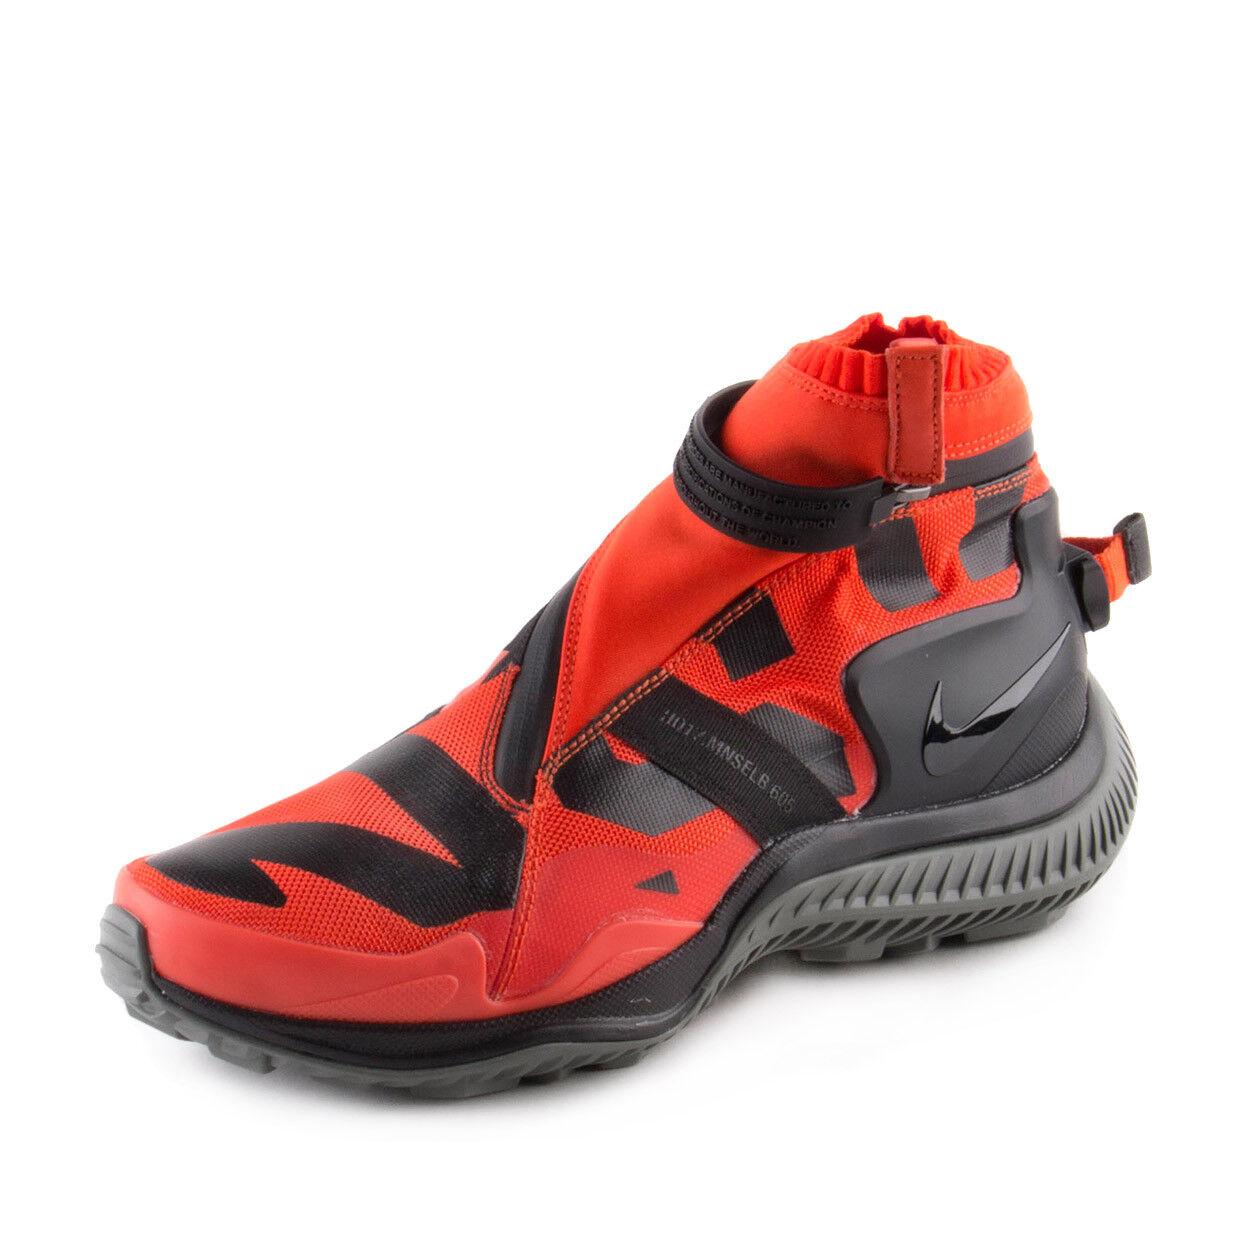 Nike Uomo NSW Gaiter Boot NikeLab Orange/Nero AA0530-800